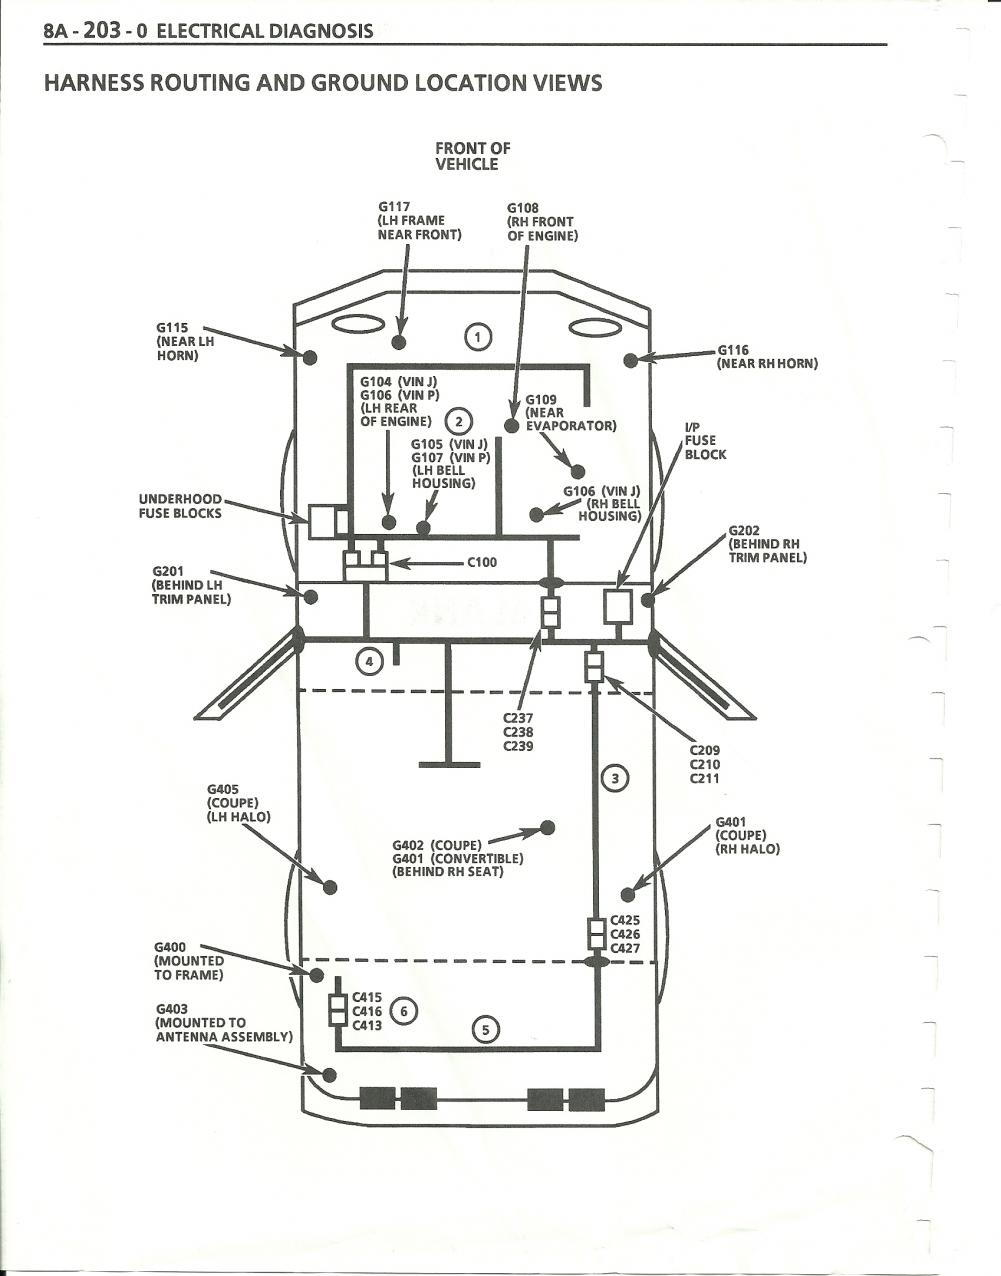 Bose radio w/ good amps, speakers intermitenet